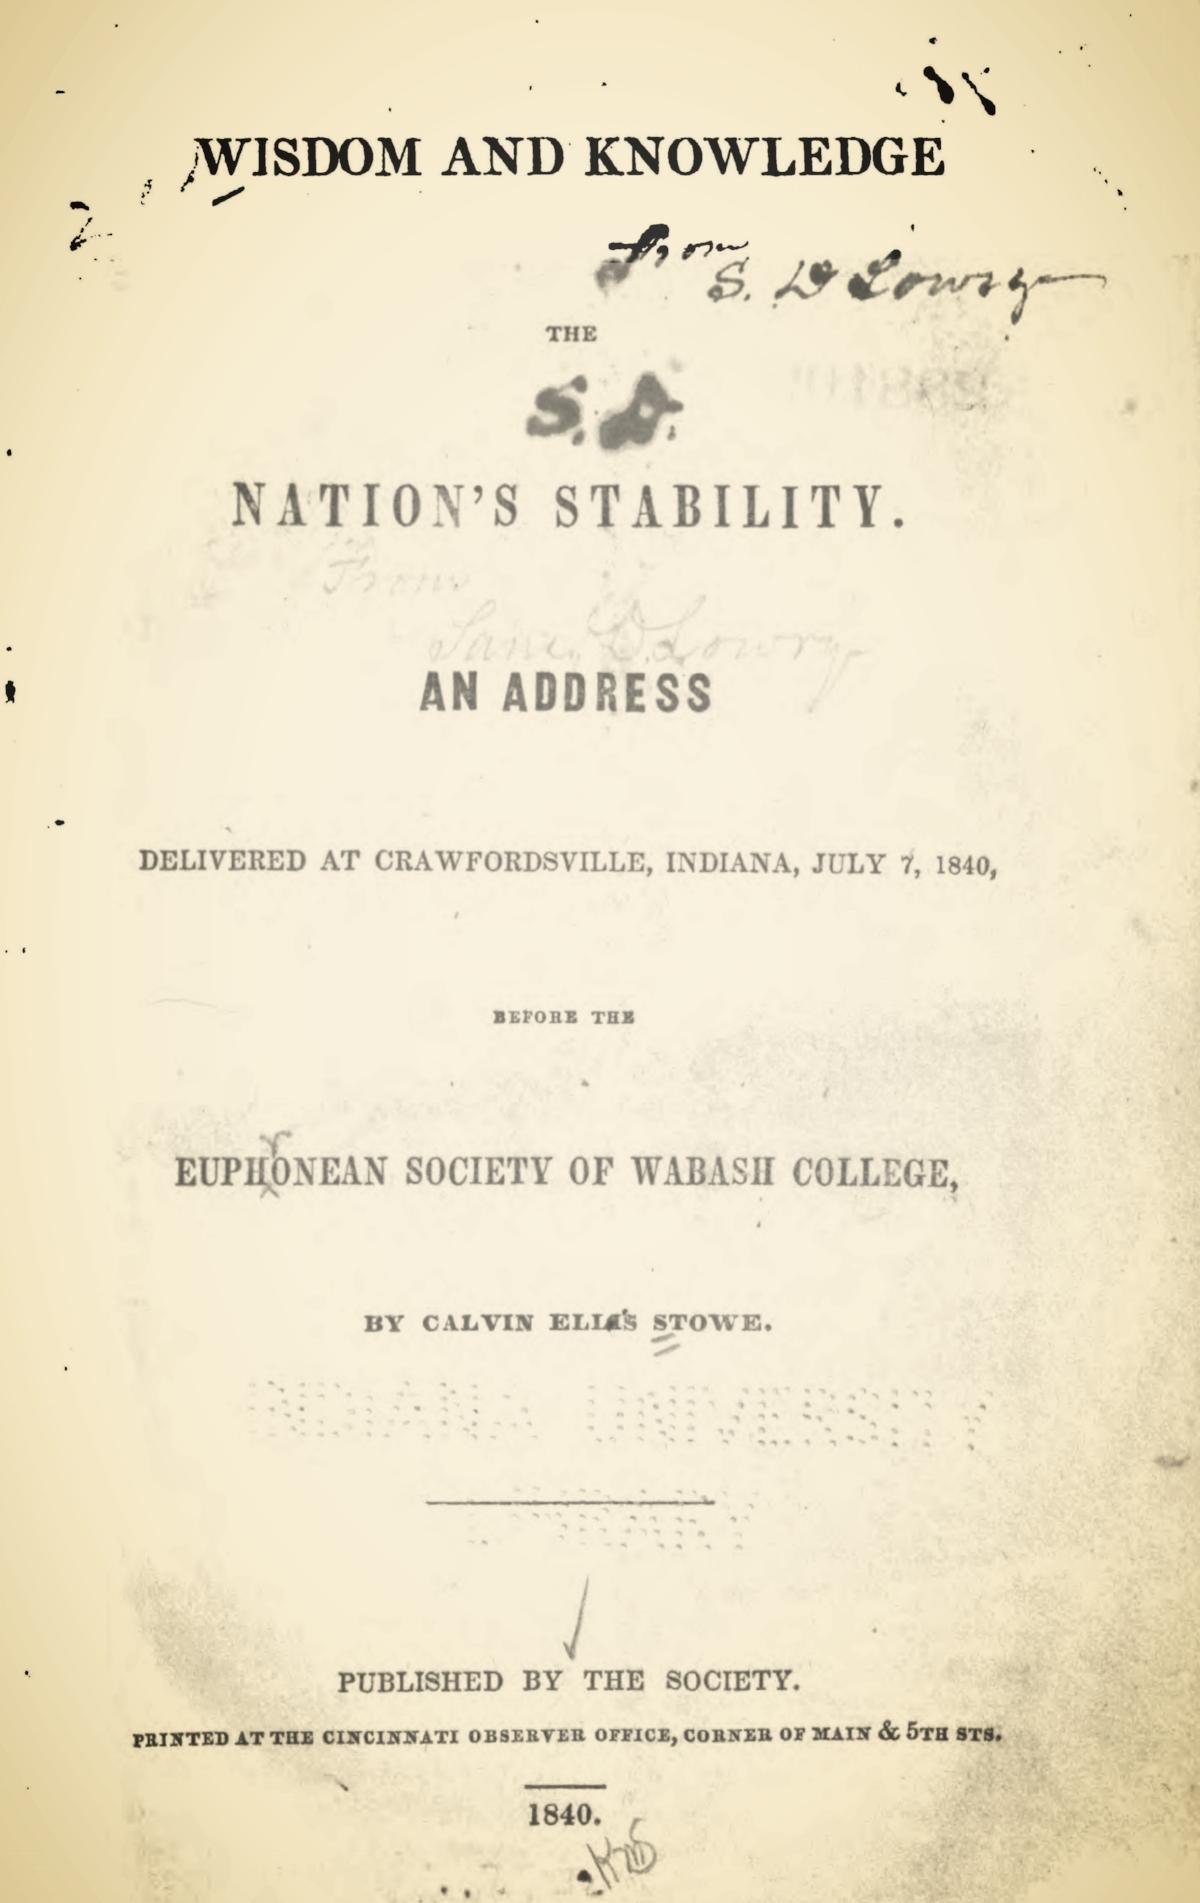 Stowe, Calvin Ellis, Wisdom and Knowledge Title Page.jpg